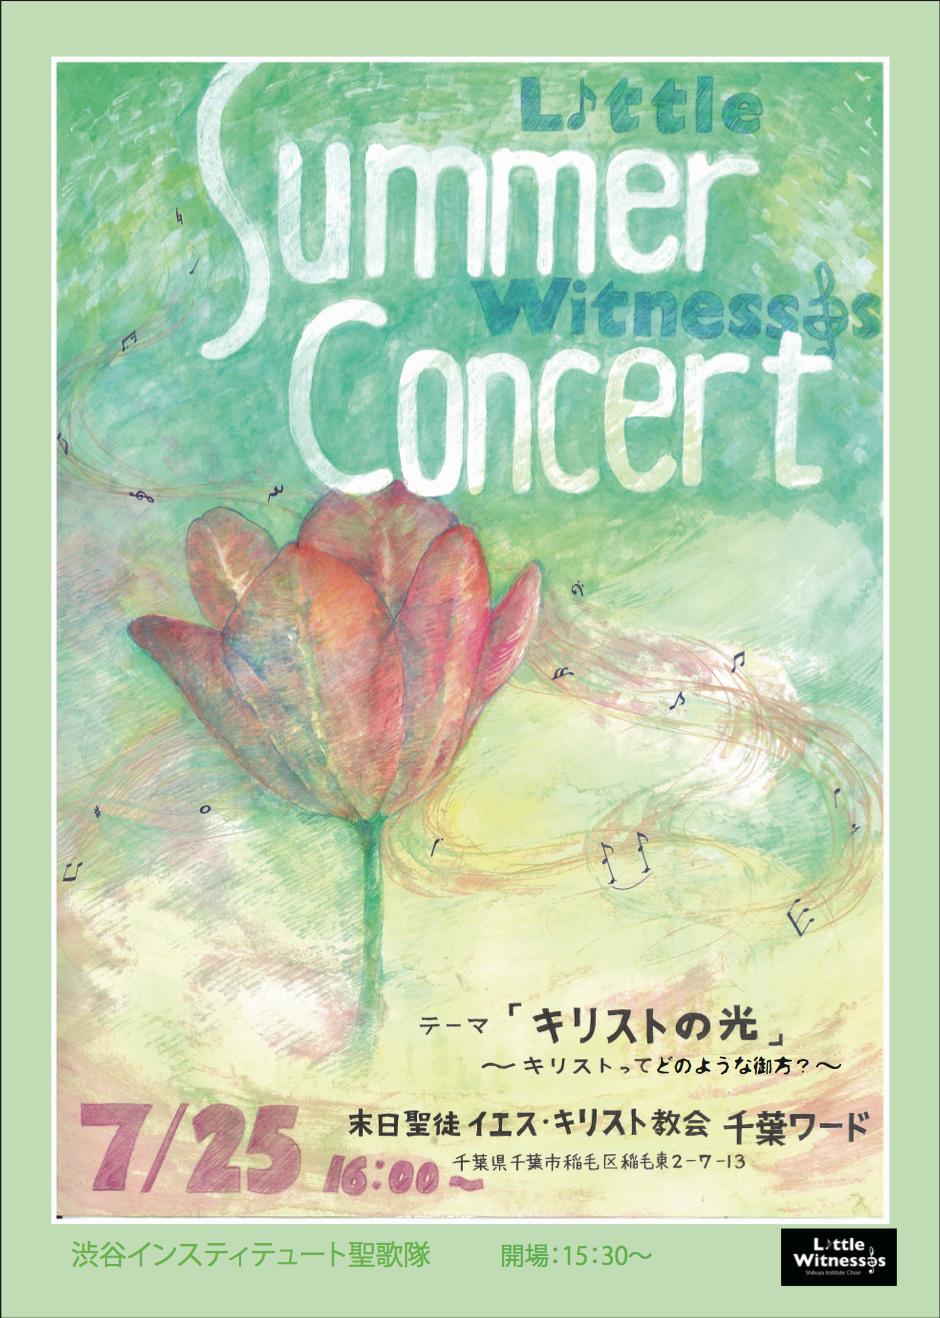 SummerConcert2015Chiba.png